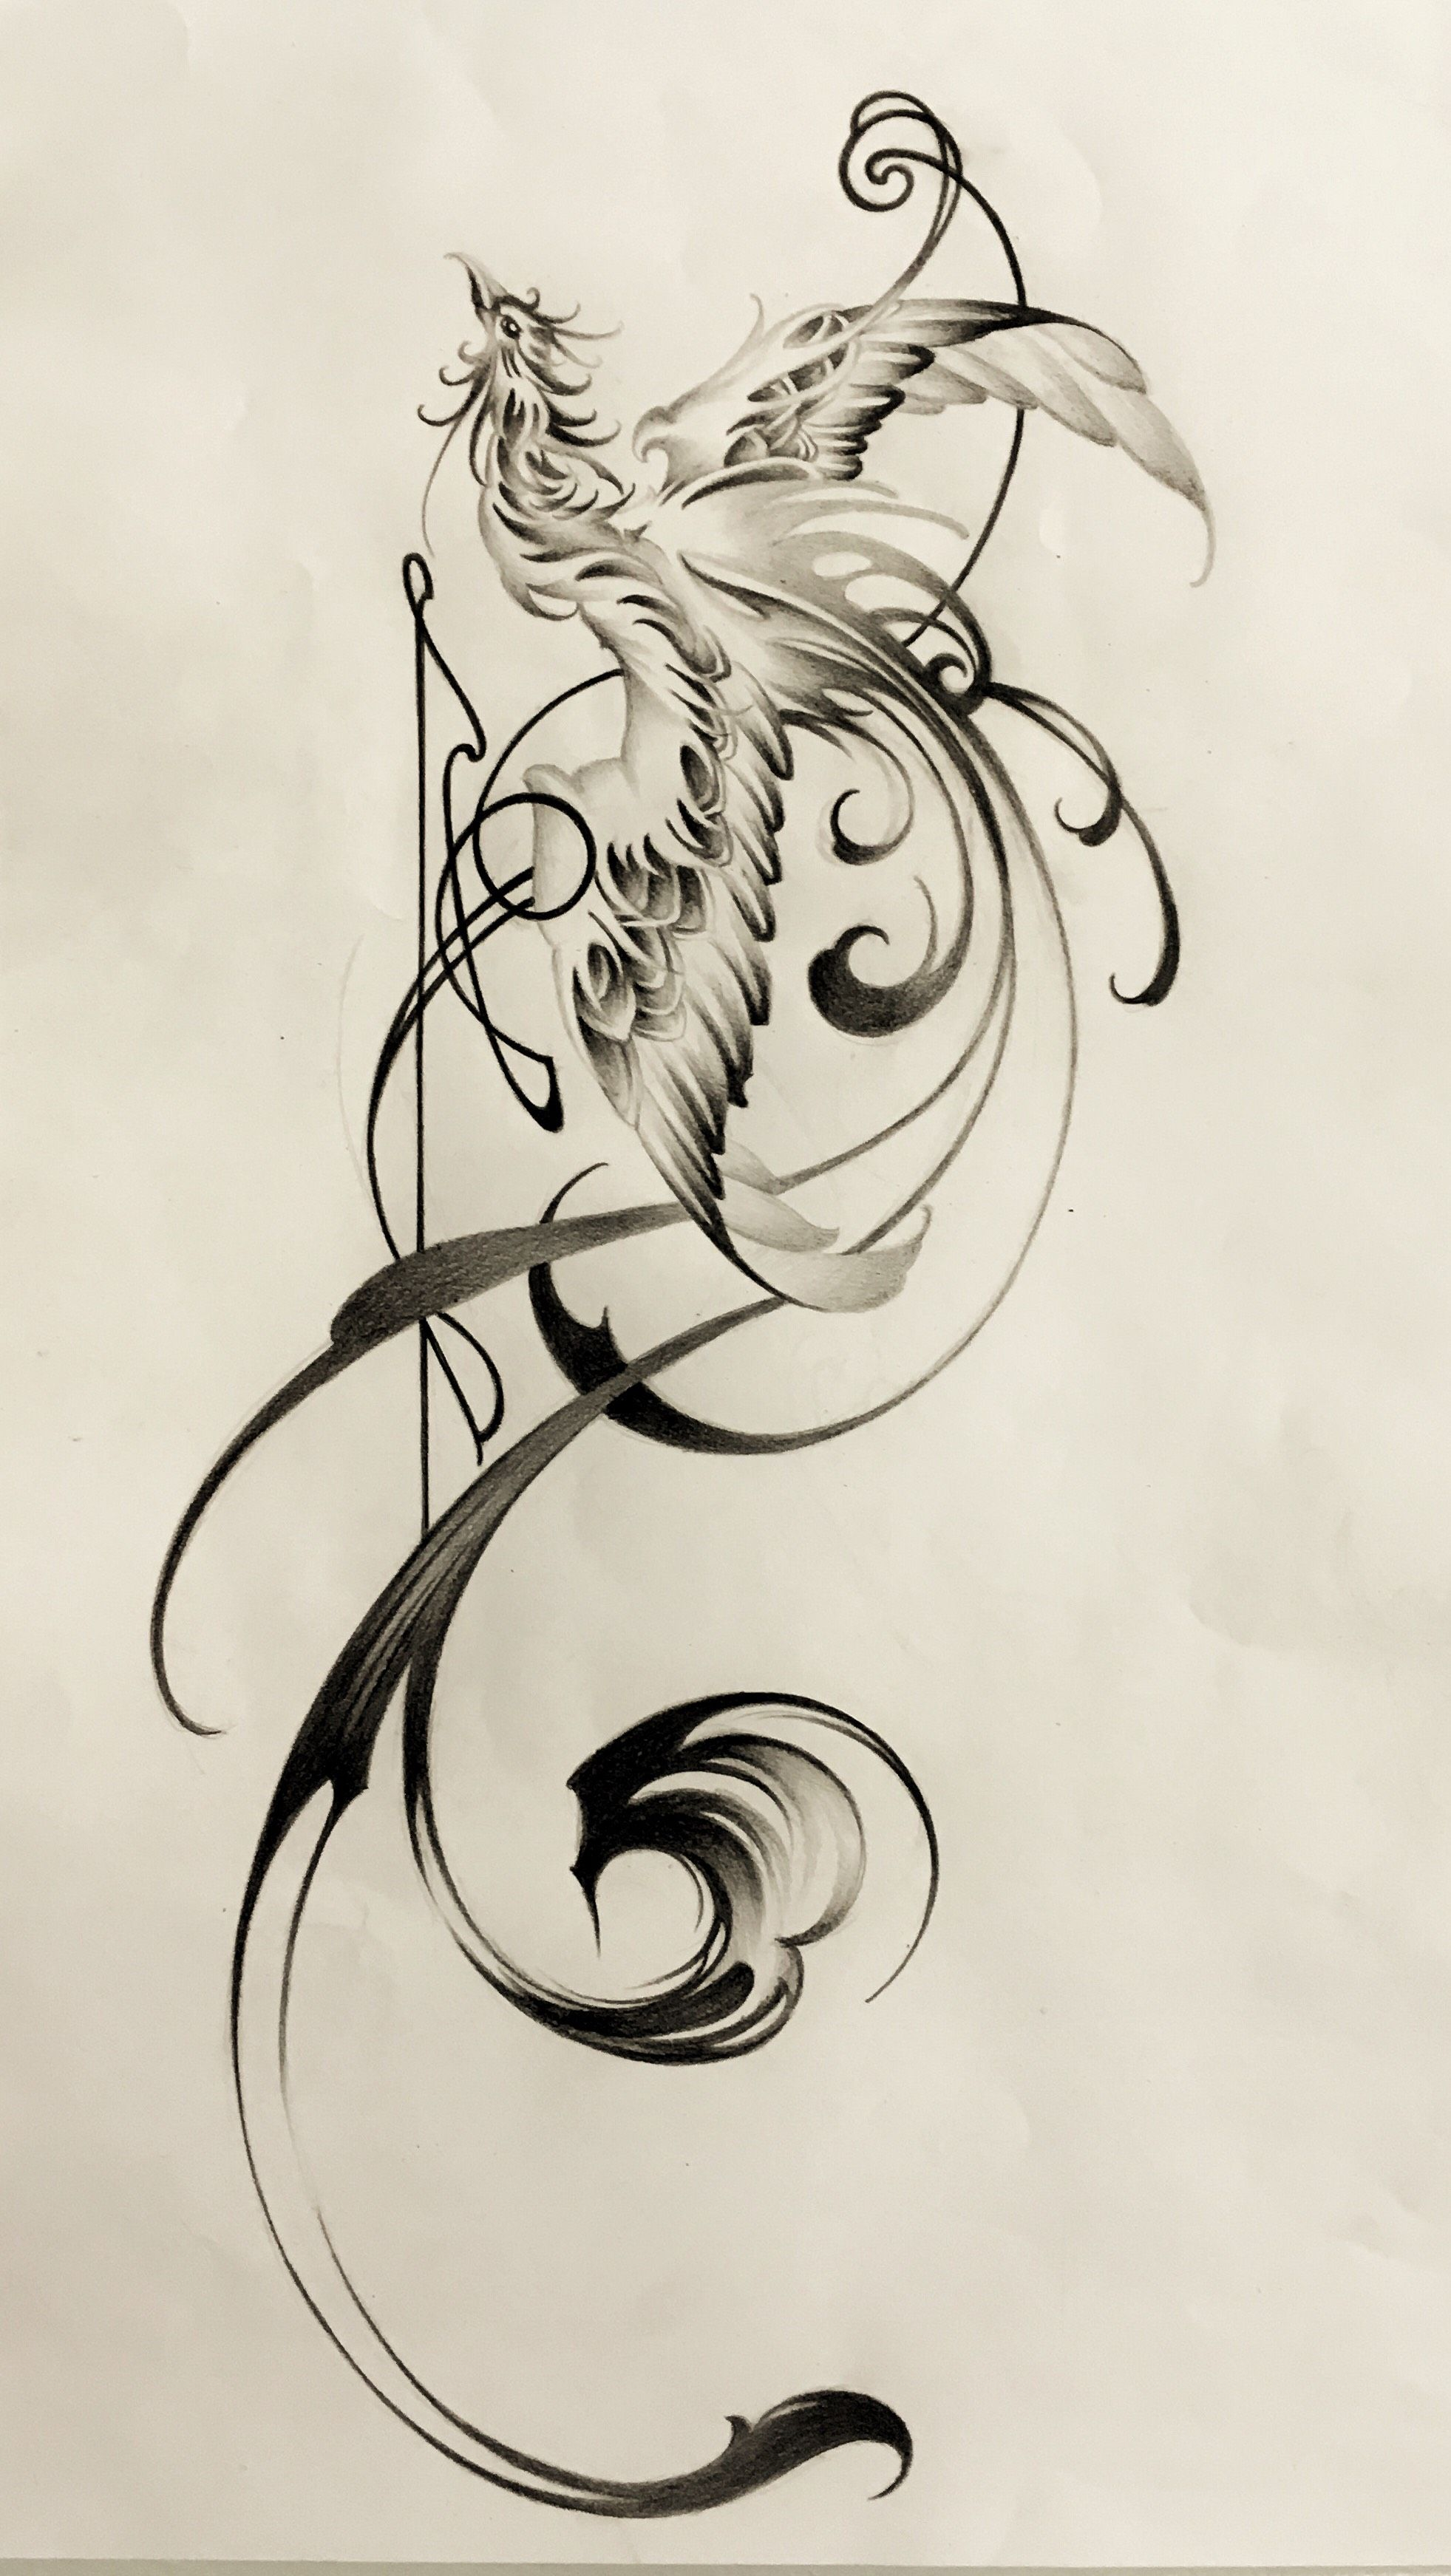 cc1309e36 phoenix with brushstrokes,tattoo design,鳳凰,刺青 sumi tattoo, タトゥー 刺青 水墨画  artwork, tattoo shop, Japanese style tattoo